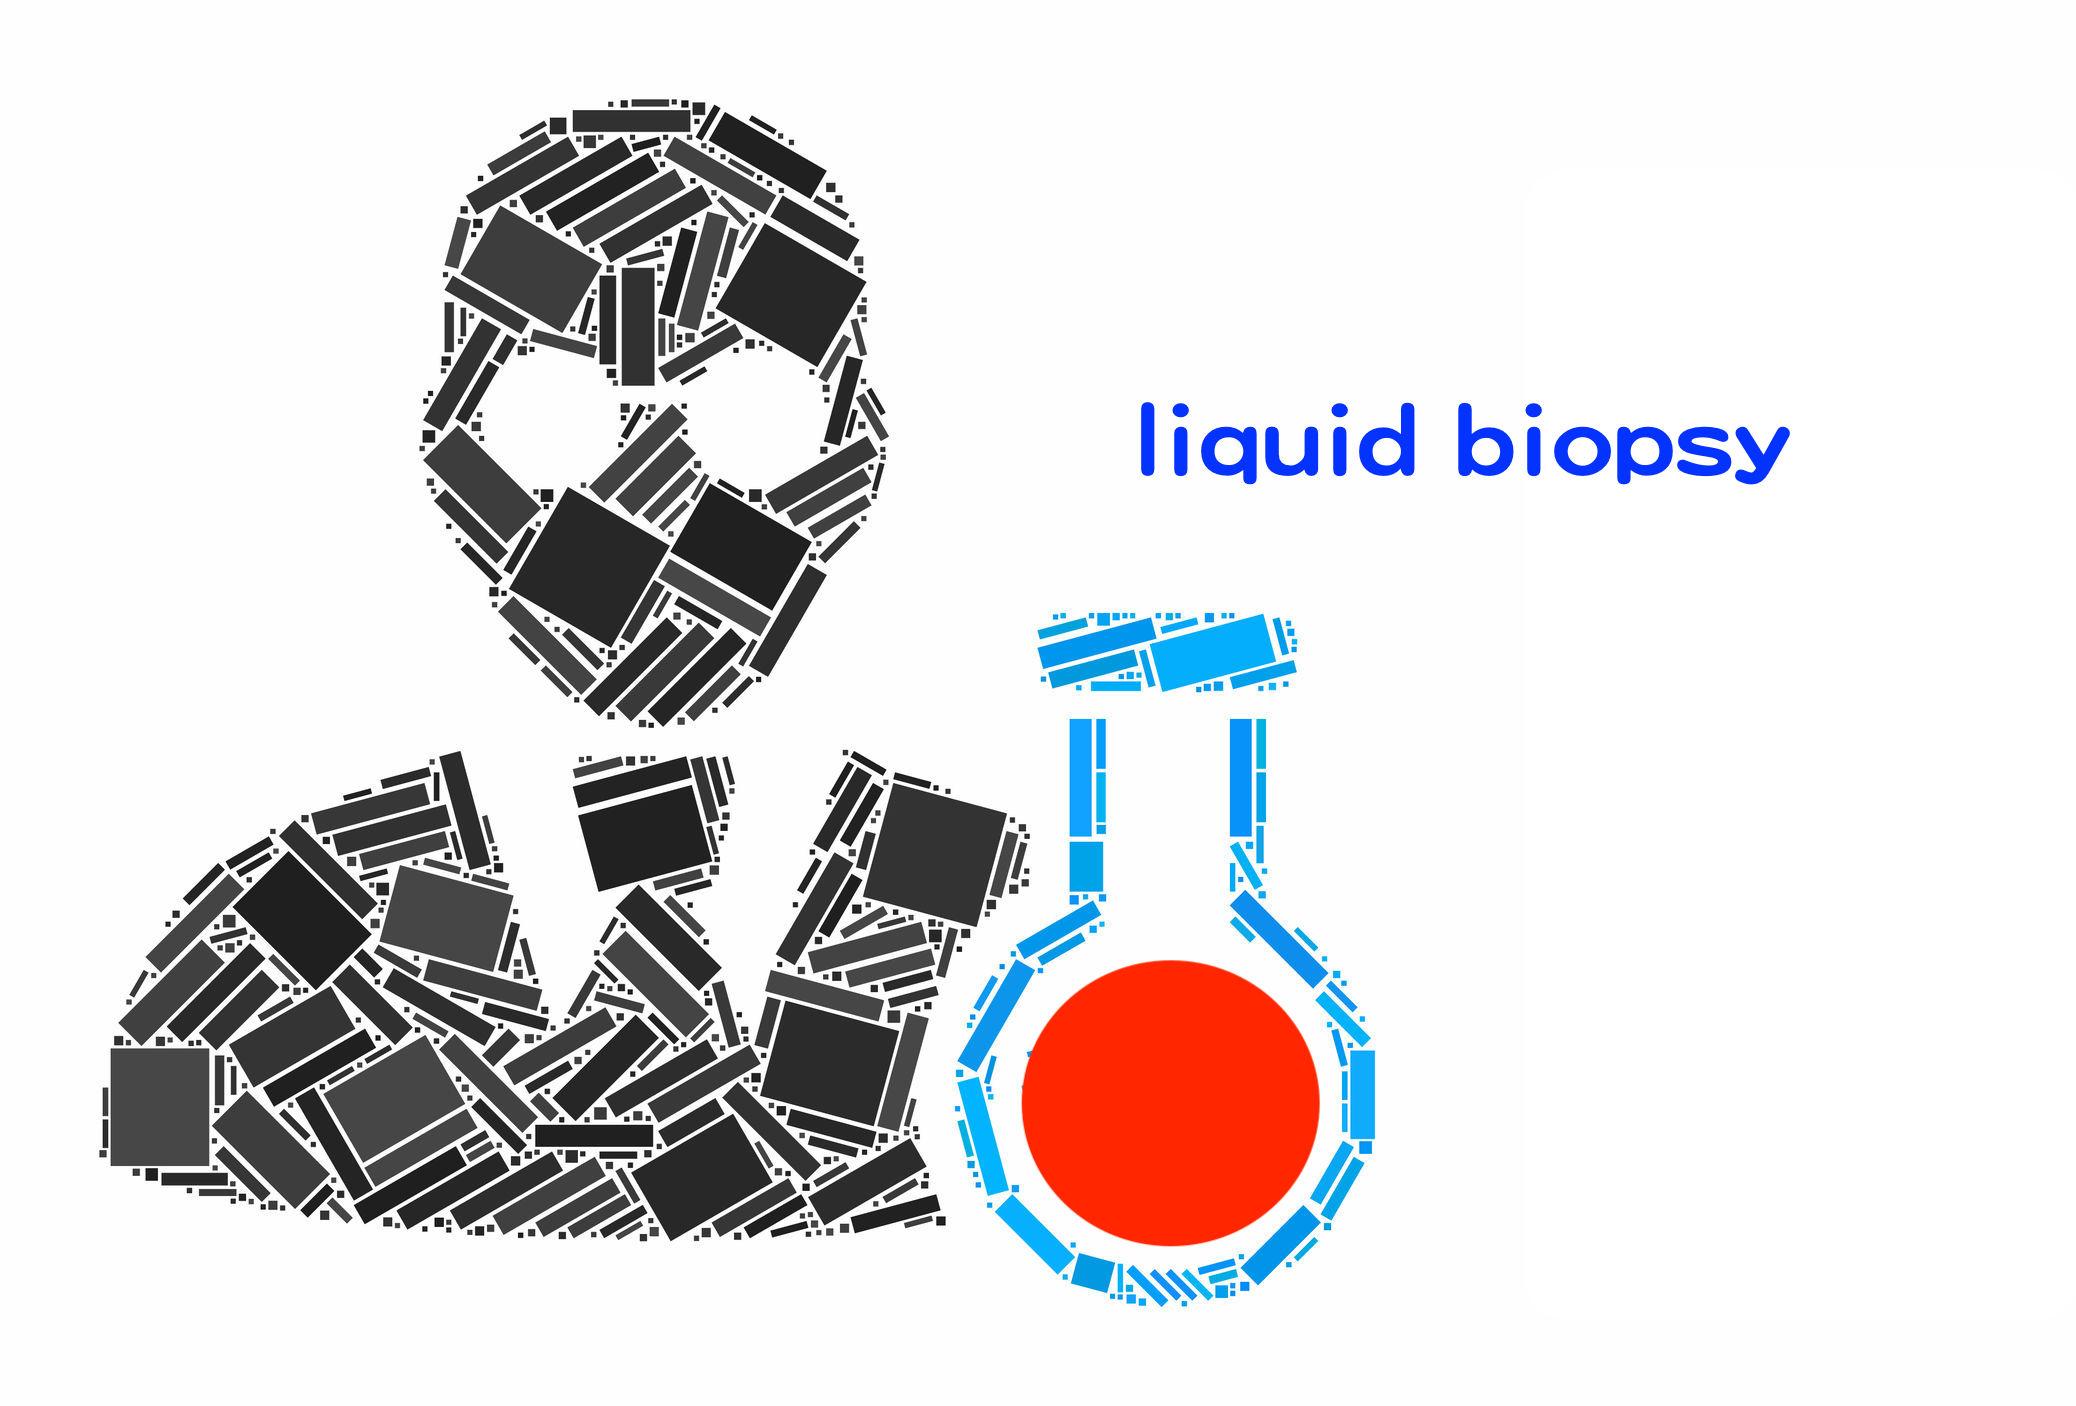 FDA 核准第一個液態切片基因檢測!診斷、治療將更快速!